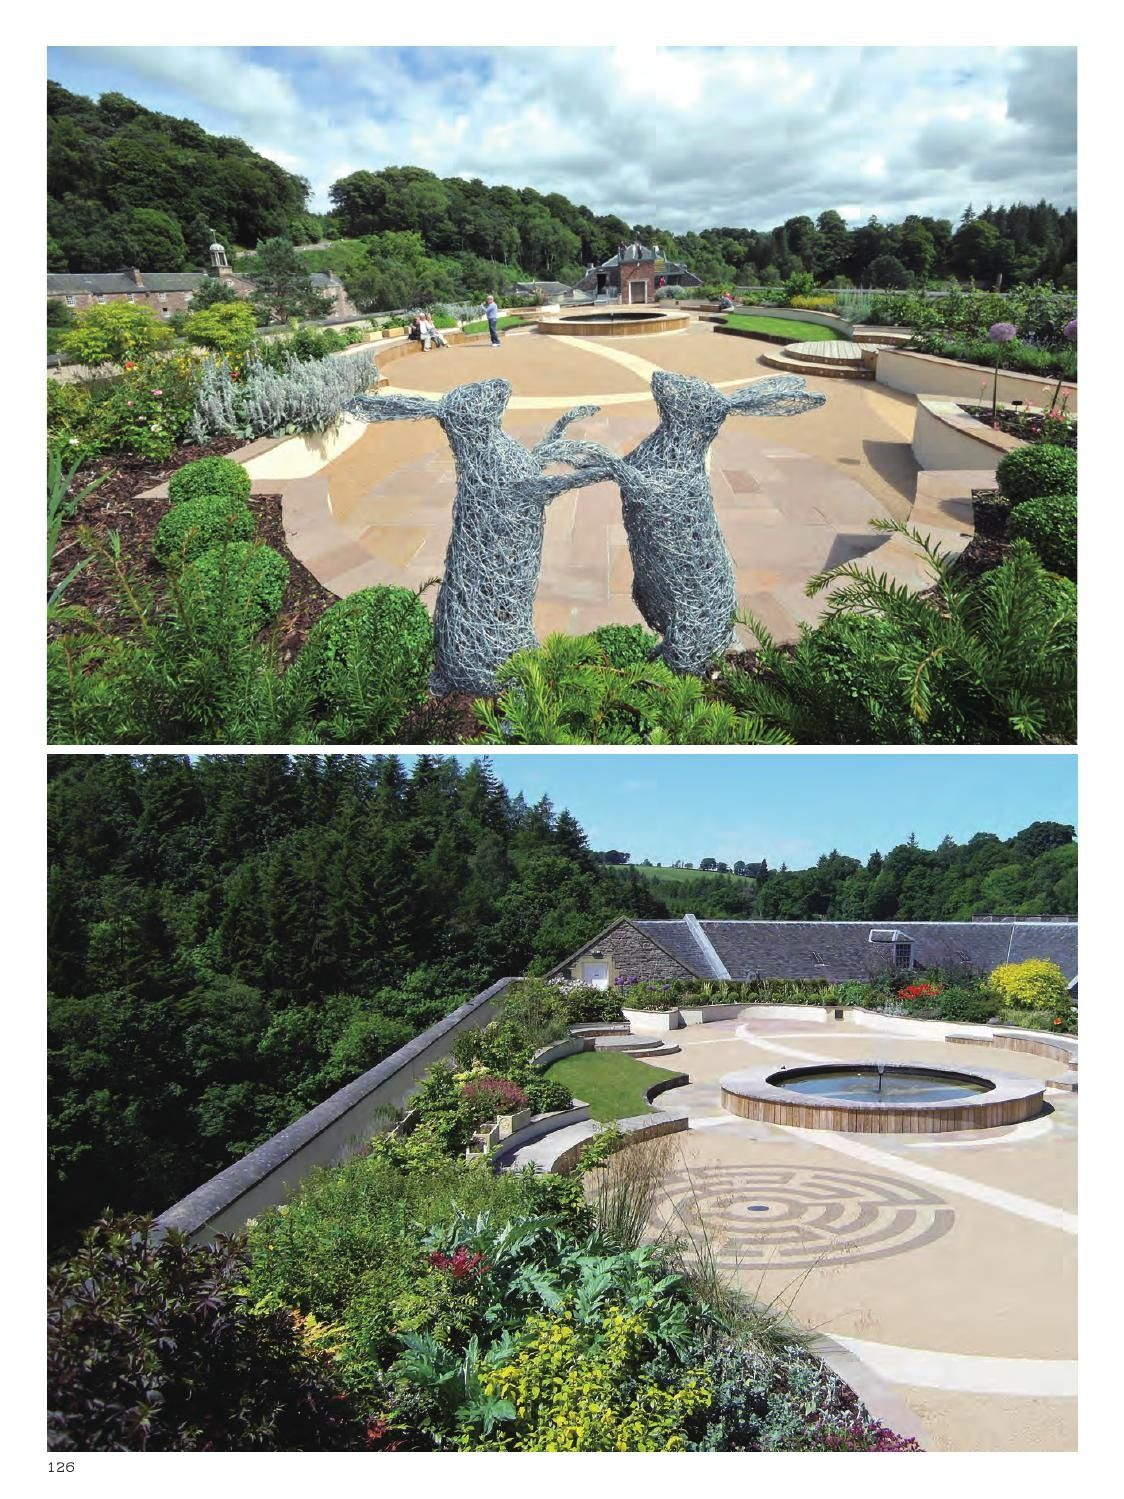 Roof Garden Landscape - World Landscape Case Studies #landsacpe #design # Garden Idea #architecture | Roof Garden, Landscape, Garden Landscaping